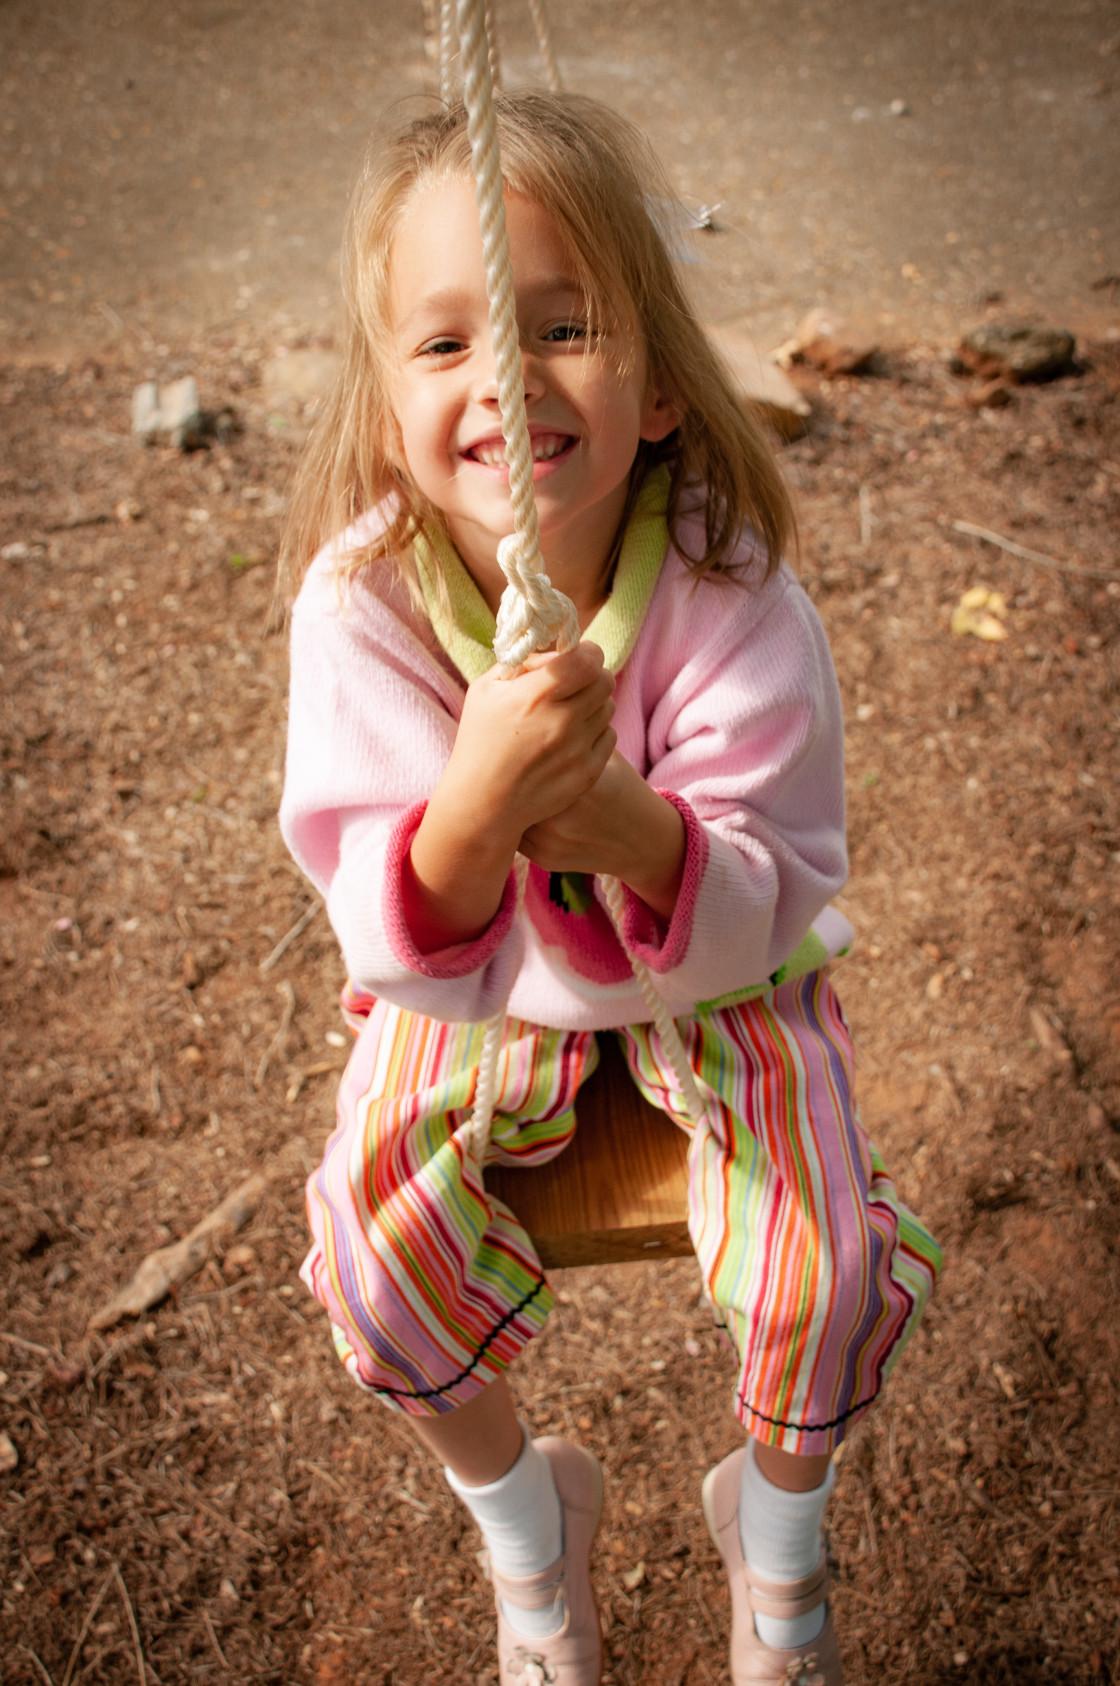 """Girl Swinging on Swing - Playful"" stock image"